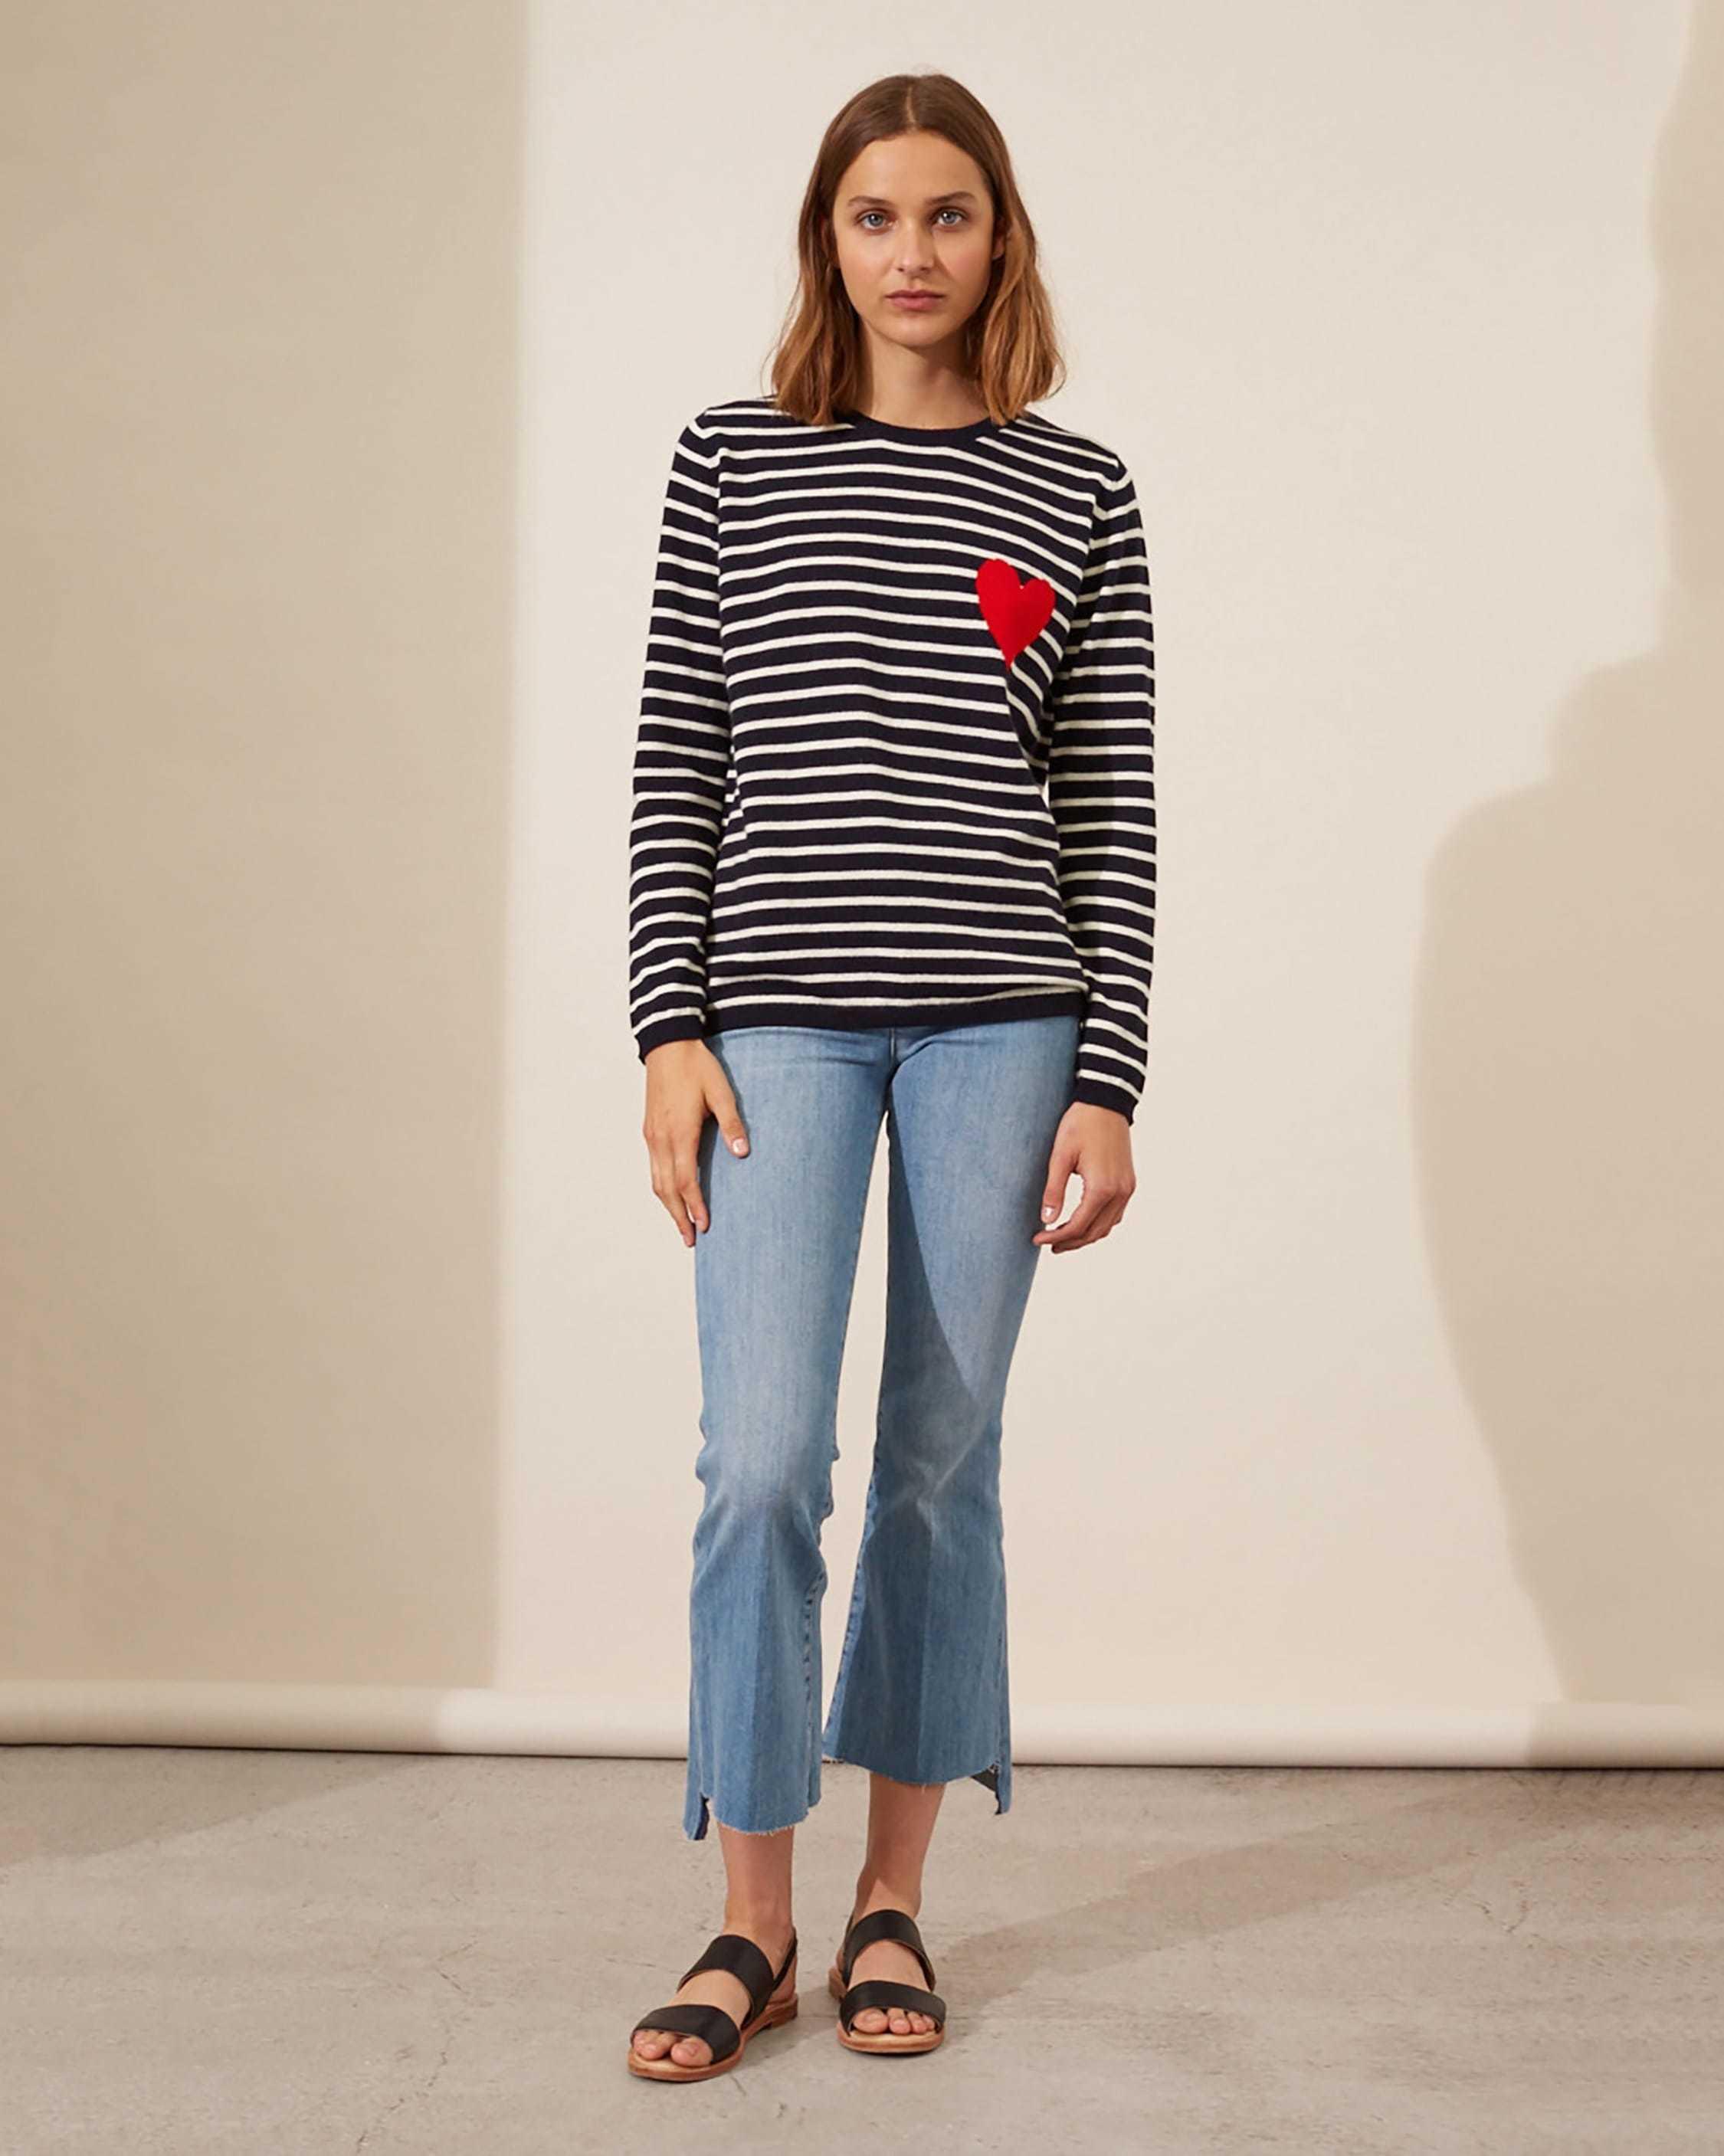 Chinti and Parker Breton Heart Sweater 4